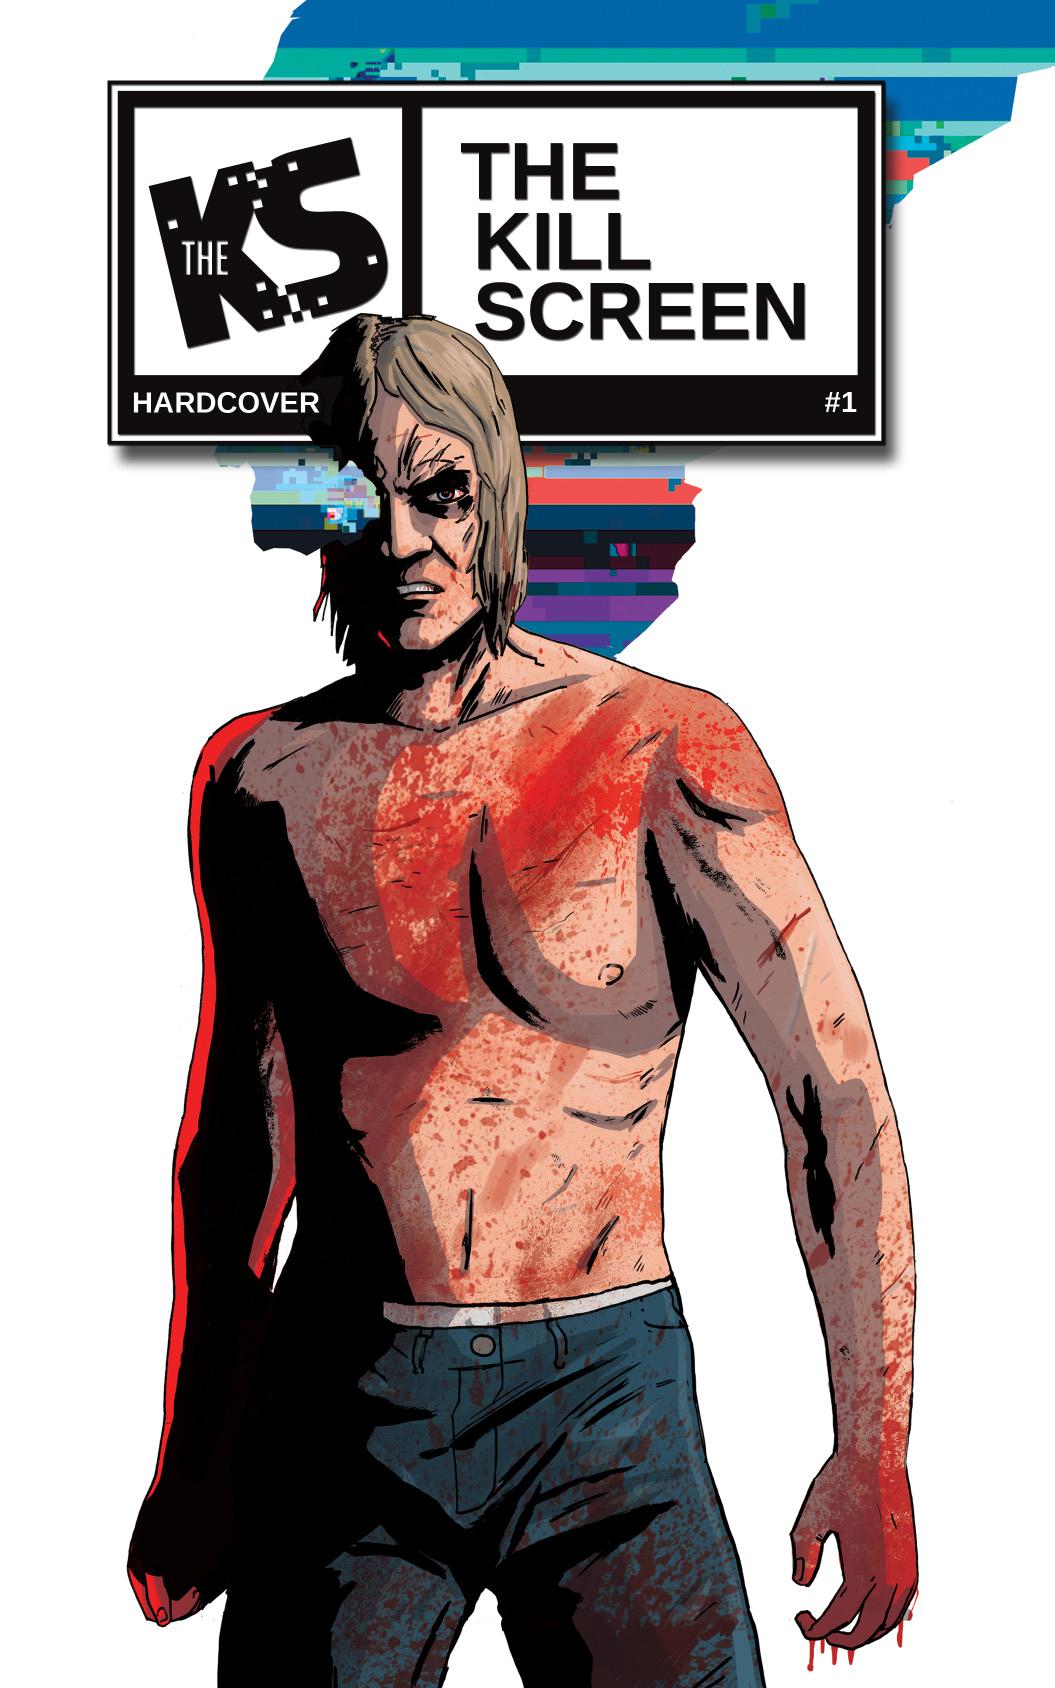 The Kill Screen hardcover cover